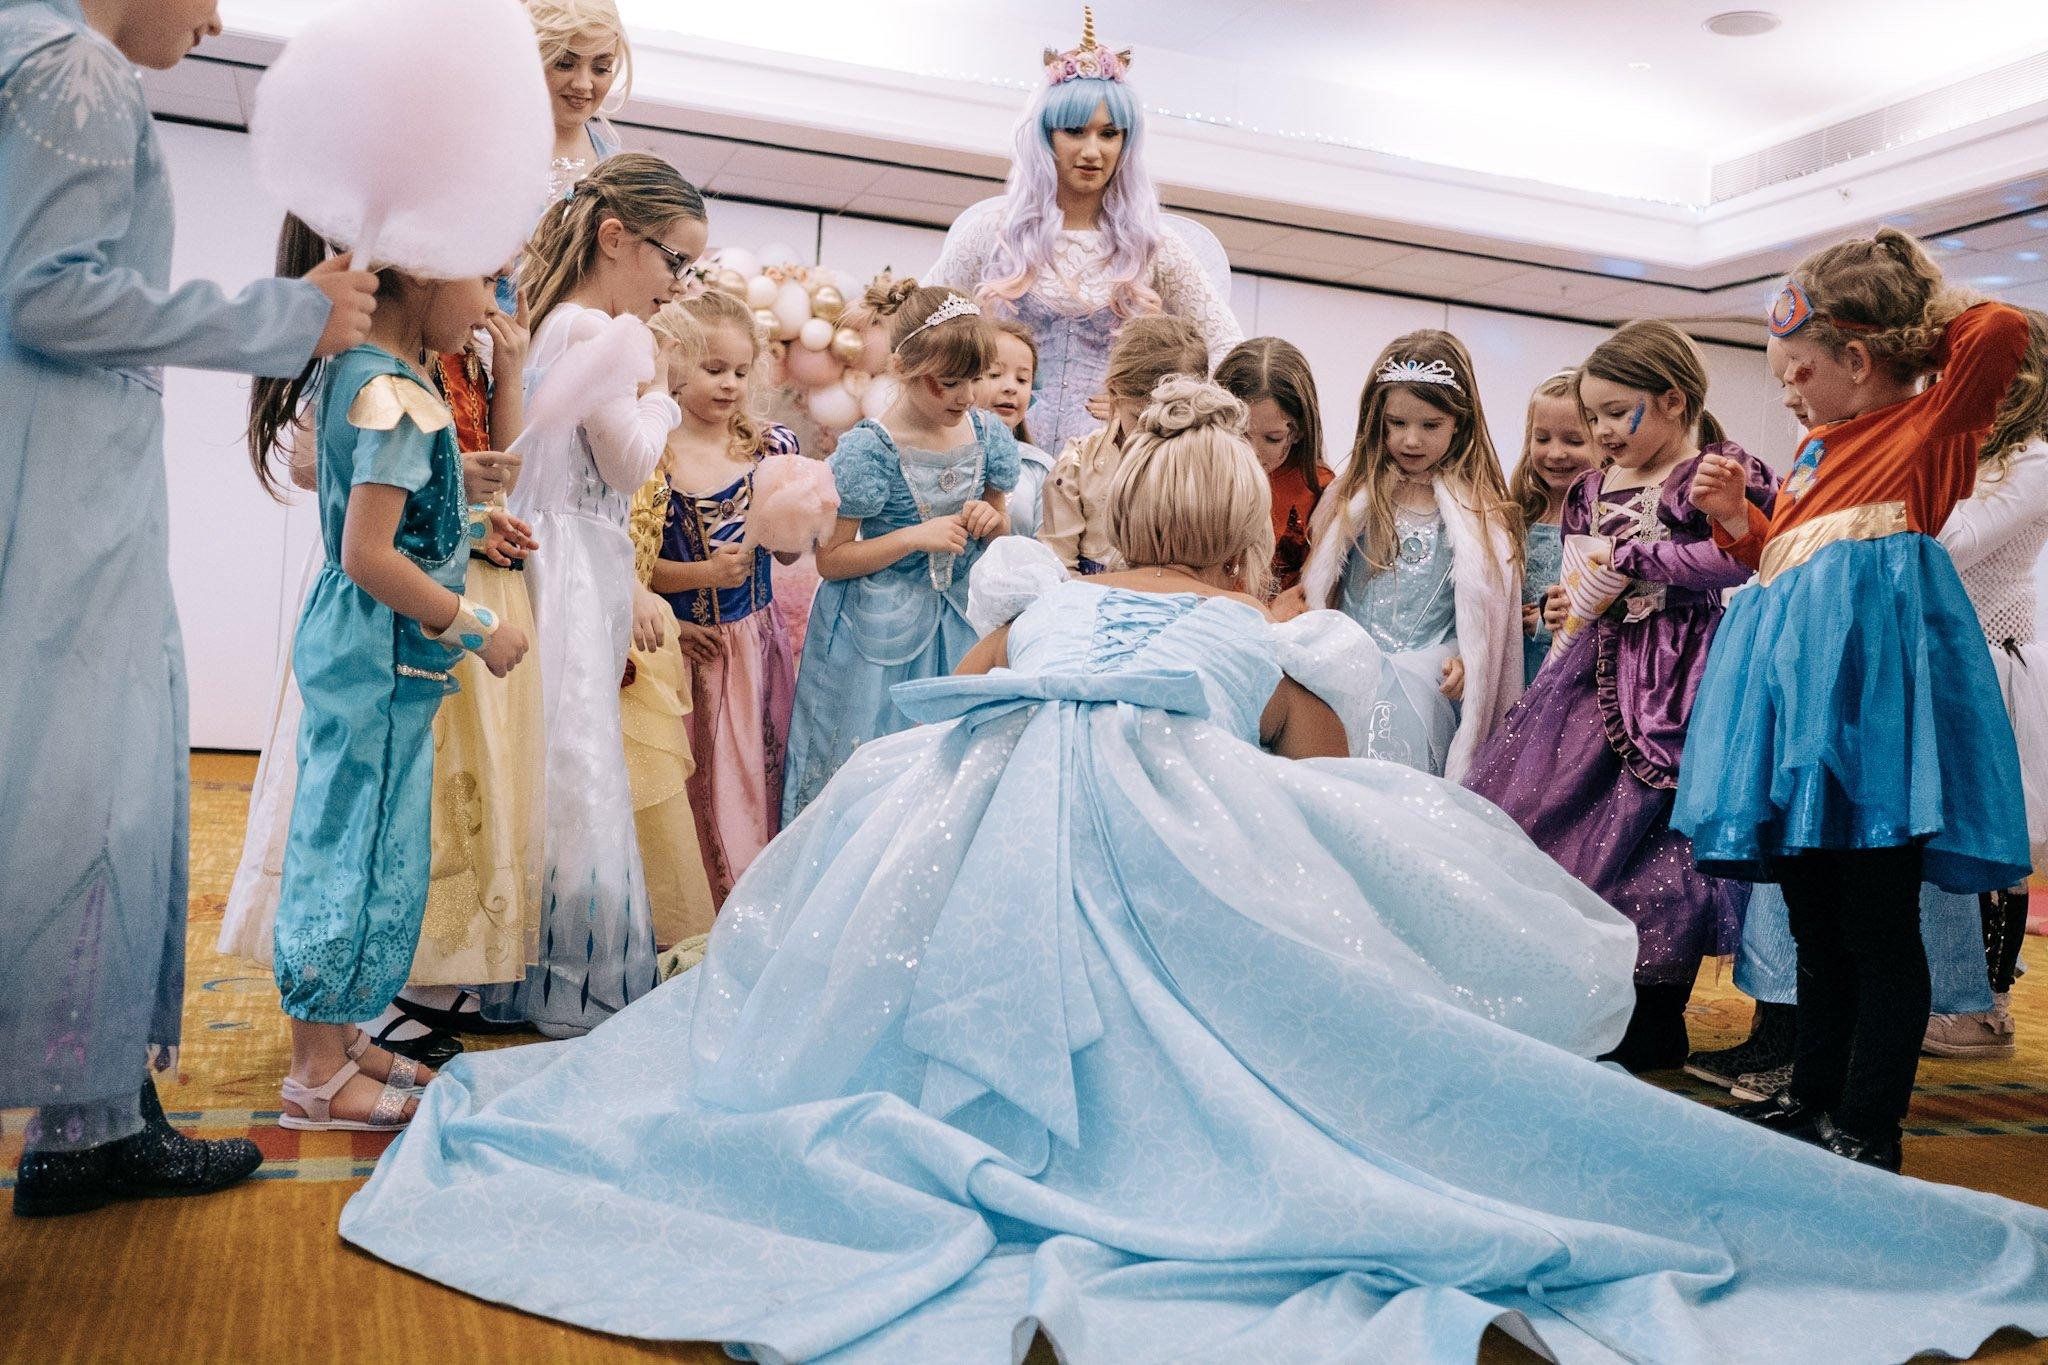 Princess party singing